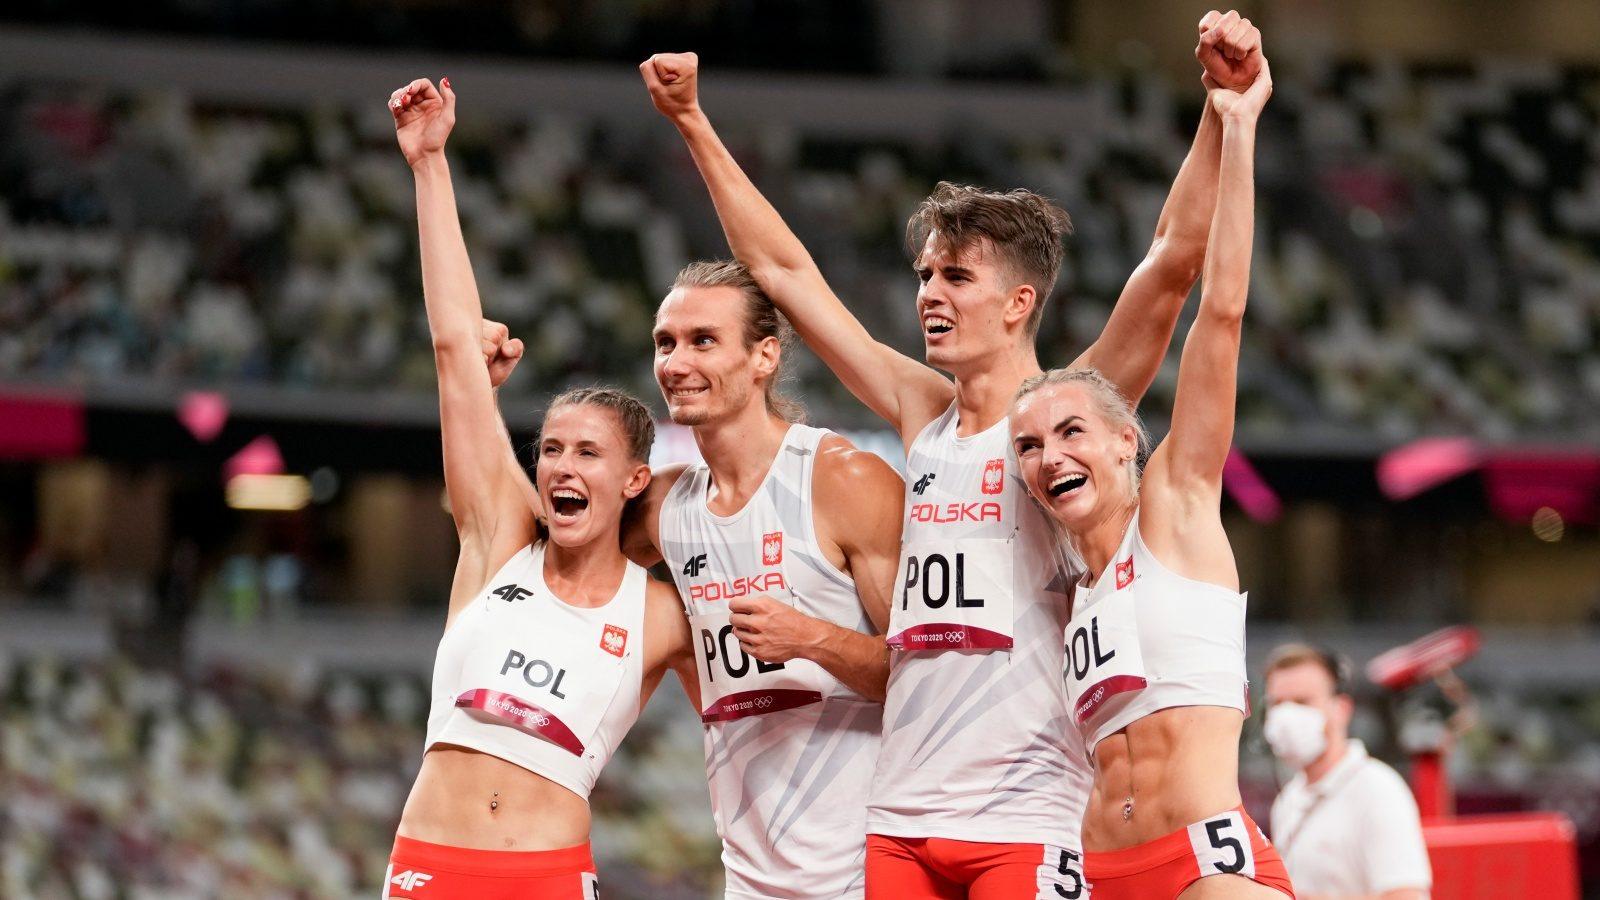 Tokyo Olympics: Poland Win Inaugural 4x400m Mixed Relay Gold